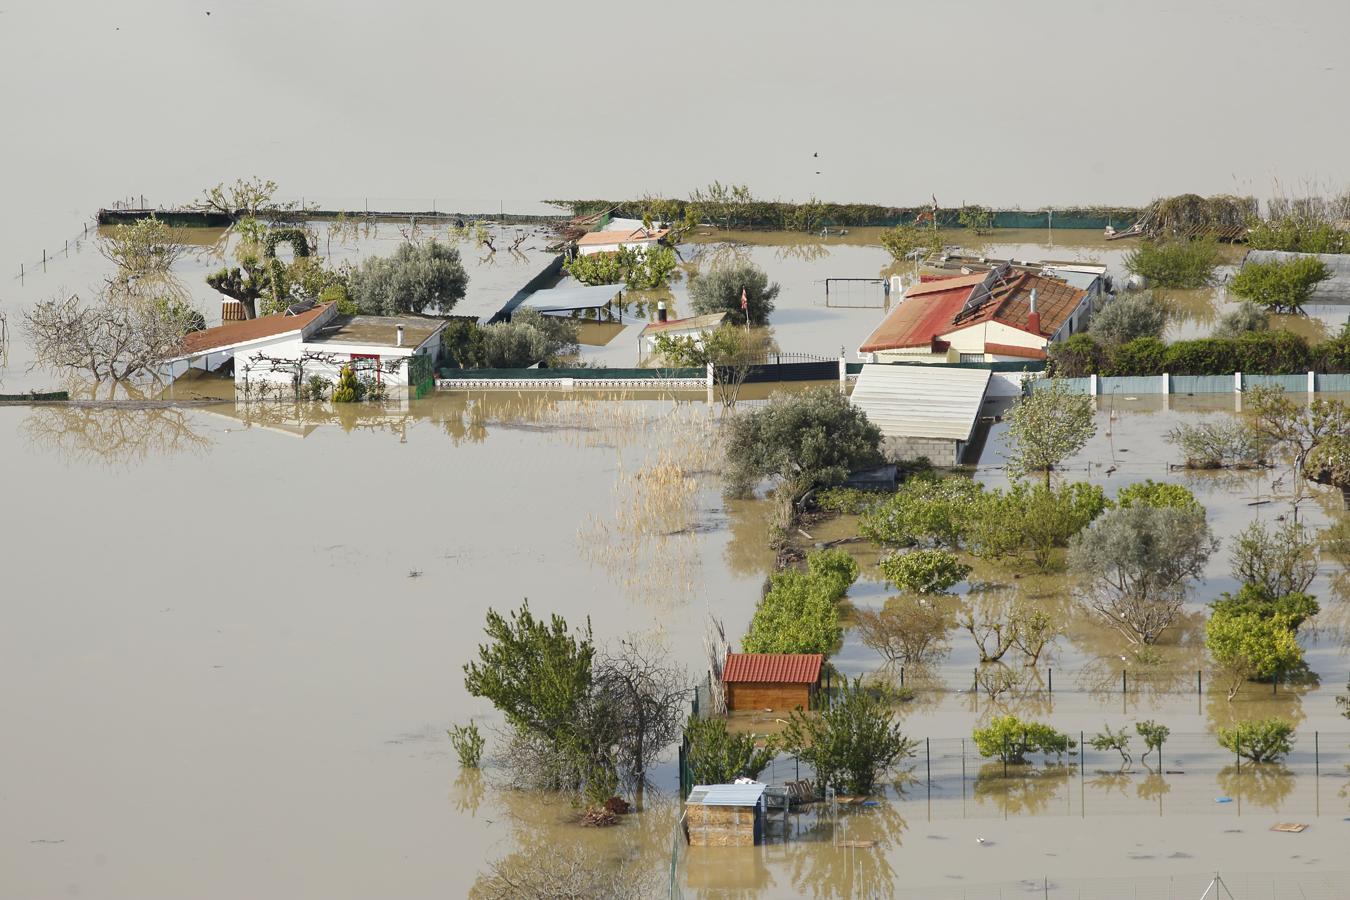 La punta de la crecida del Ebro a su llegada a Zaragoza